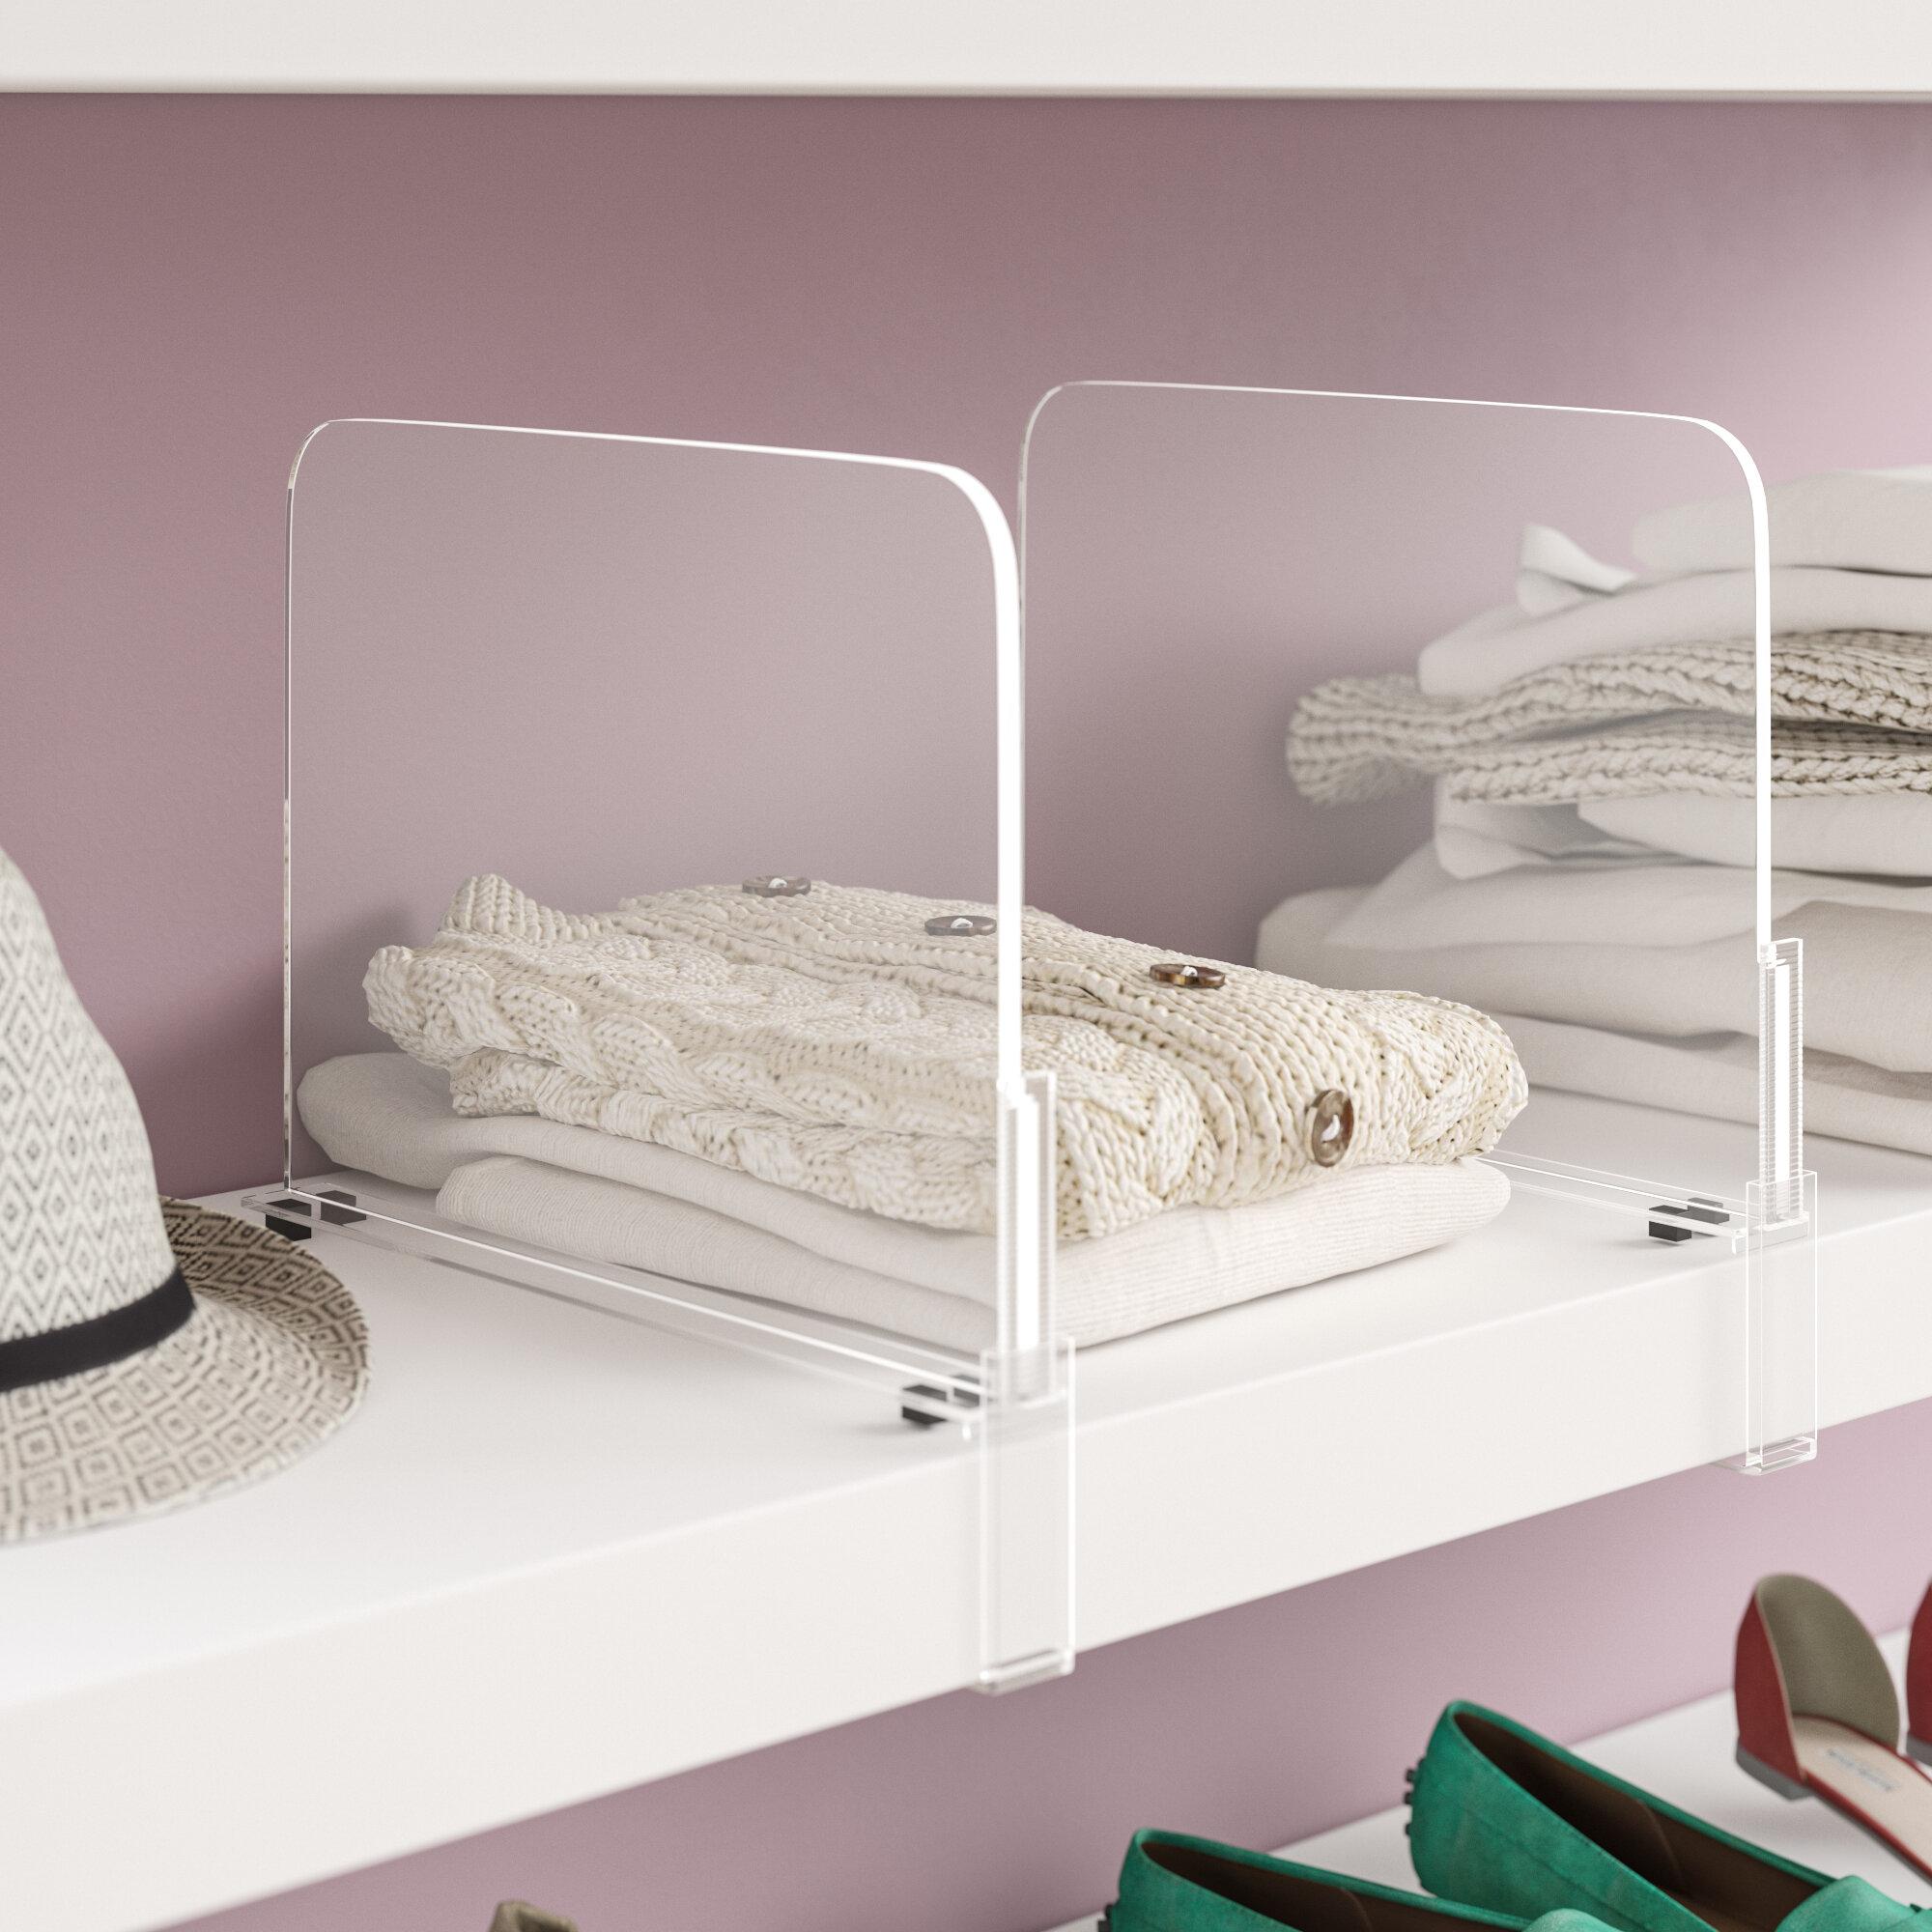 Merveilleux Bowie Acrylic Shelf Dividers Closet Shelves Organizer Separator